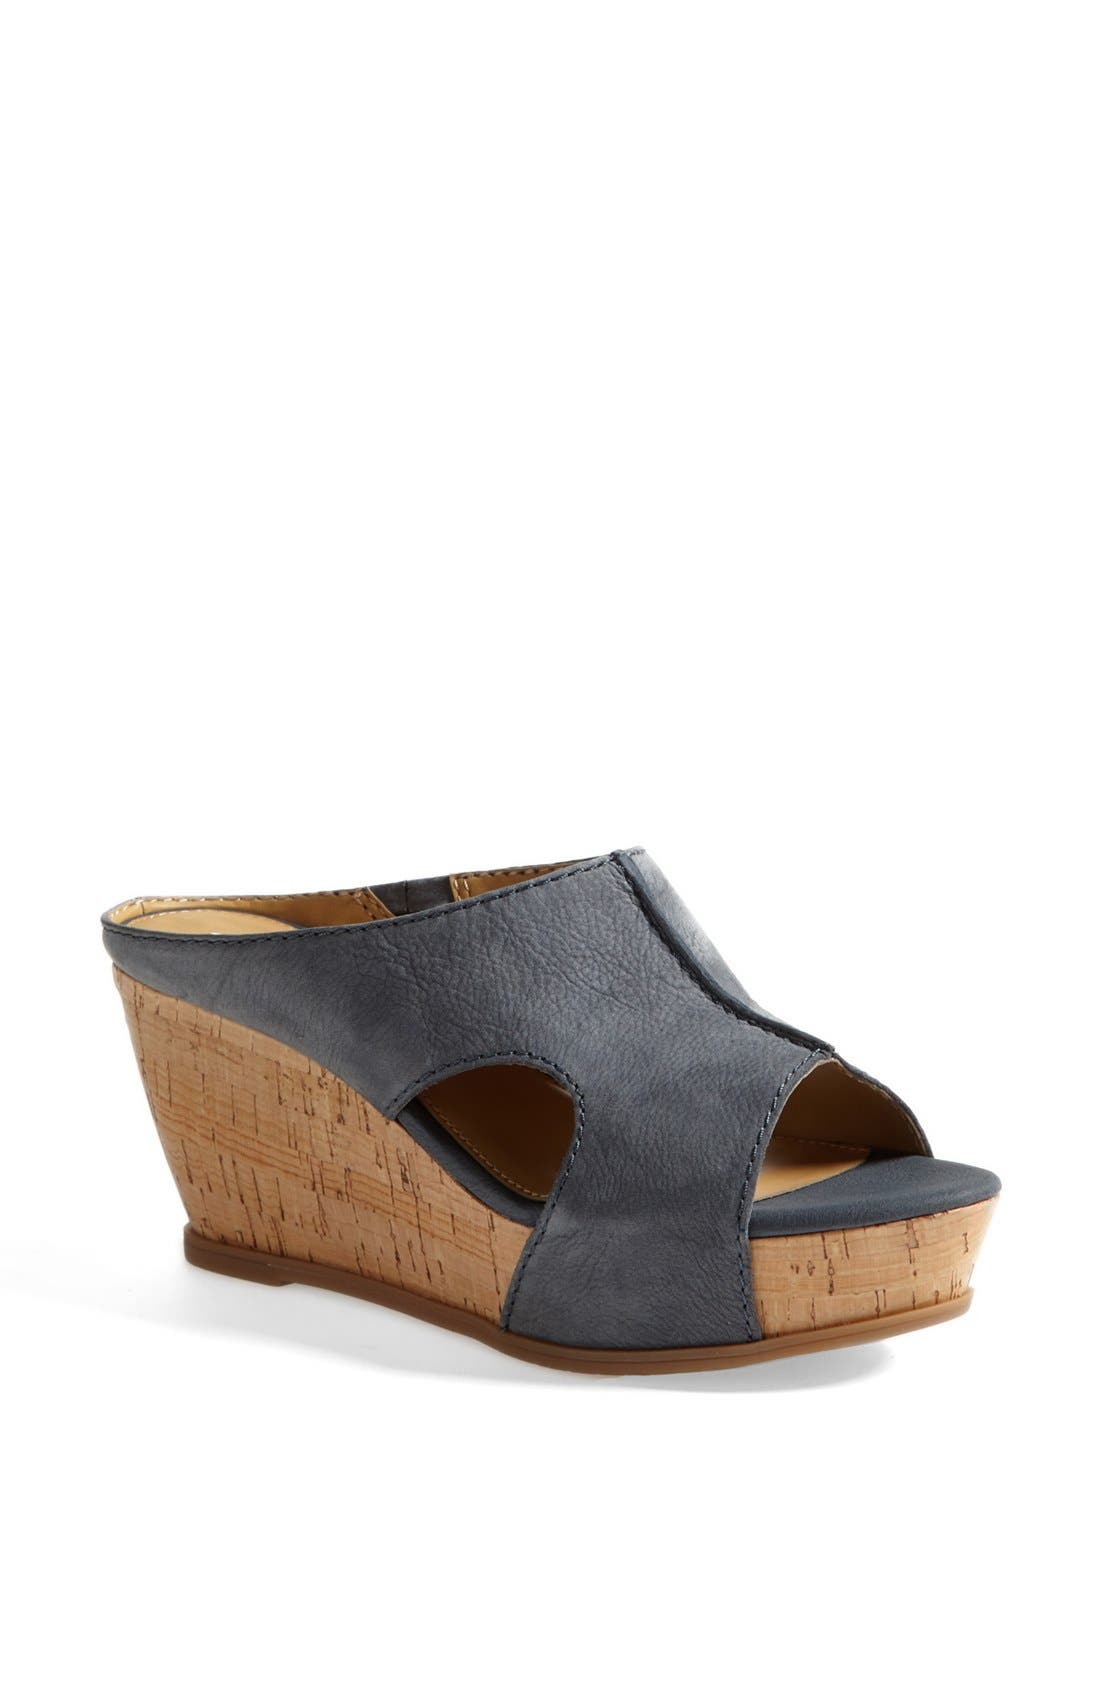 Alternate Image 1 Selected - Franco Sarto 'Fiora' Sandal (Nordstrom Exclusive)